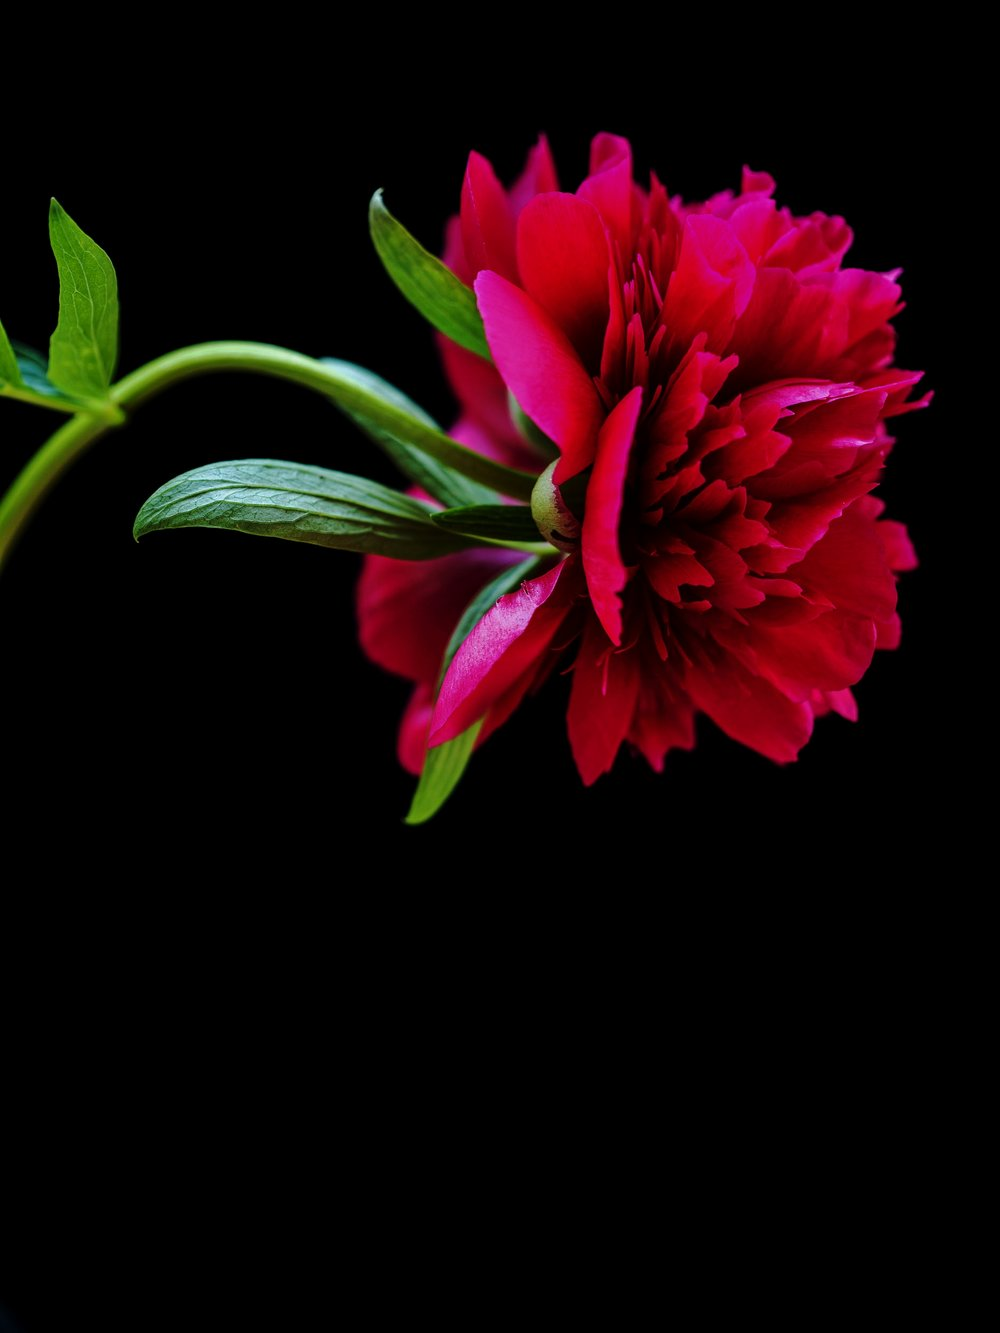 www.iaincrockart.com_flora-006901.jpg